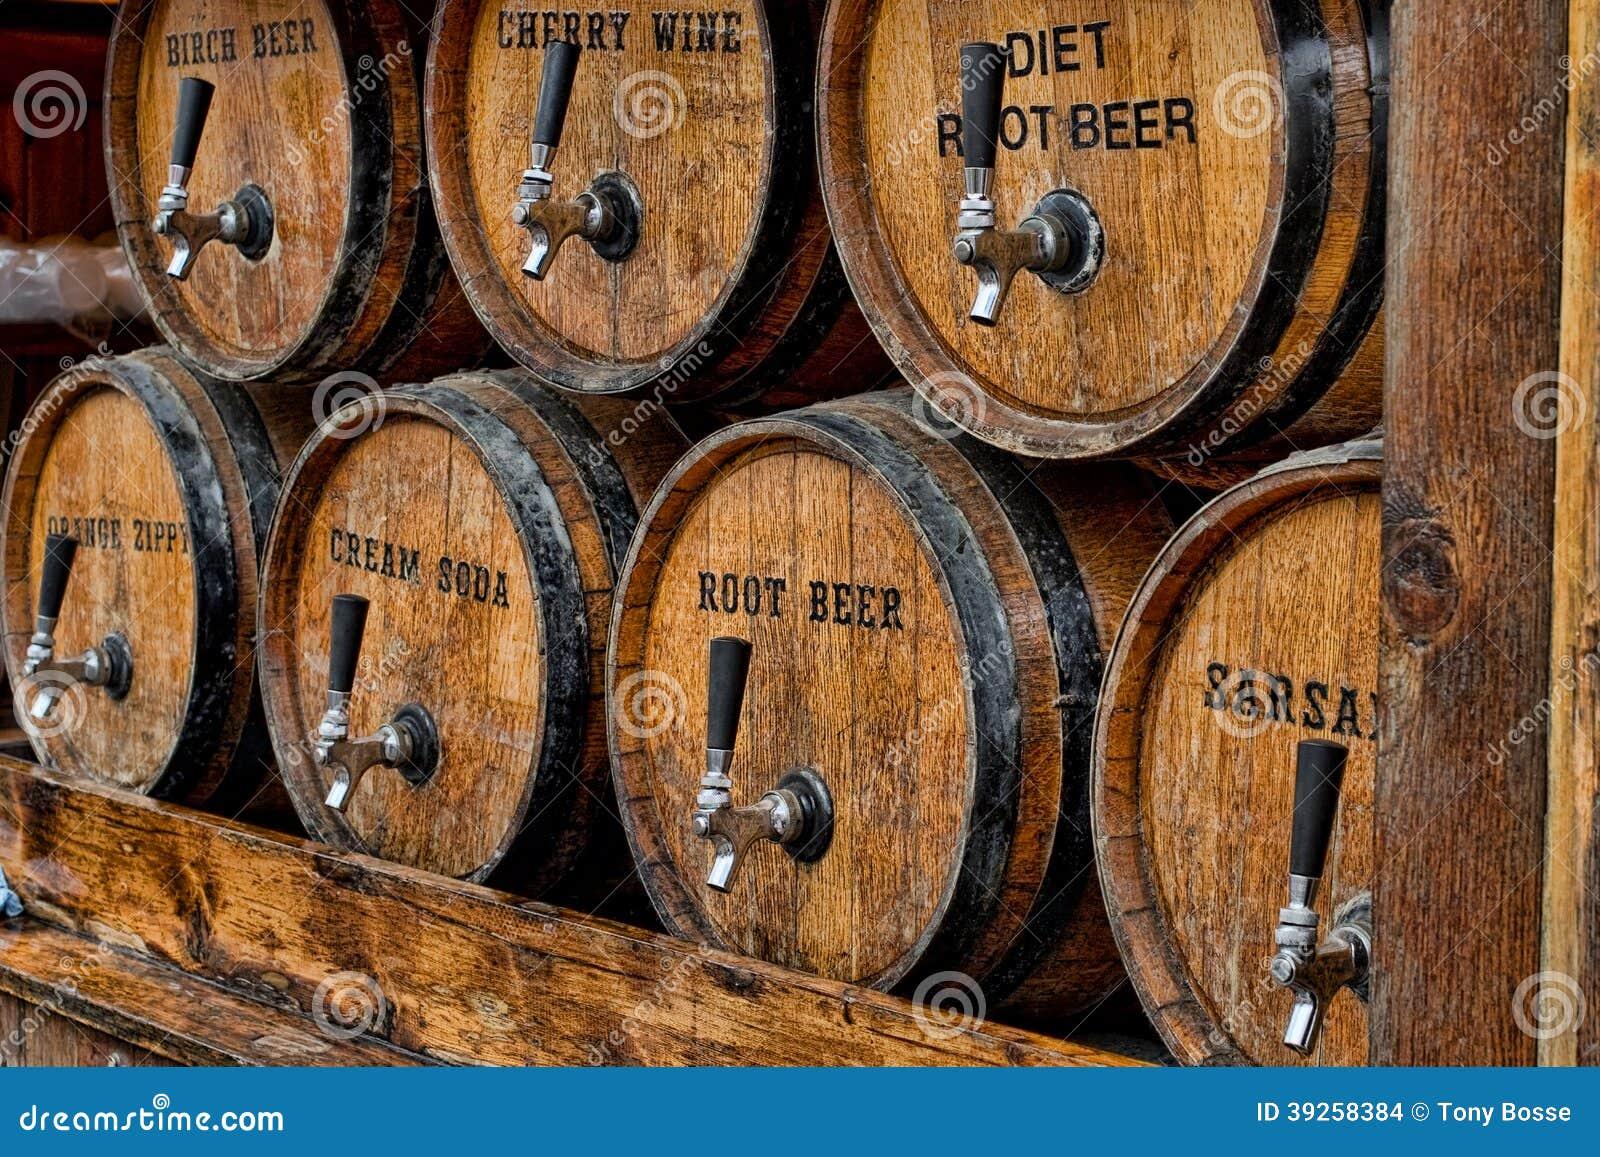 Barriles de la soda